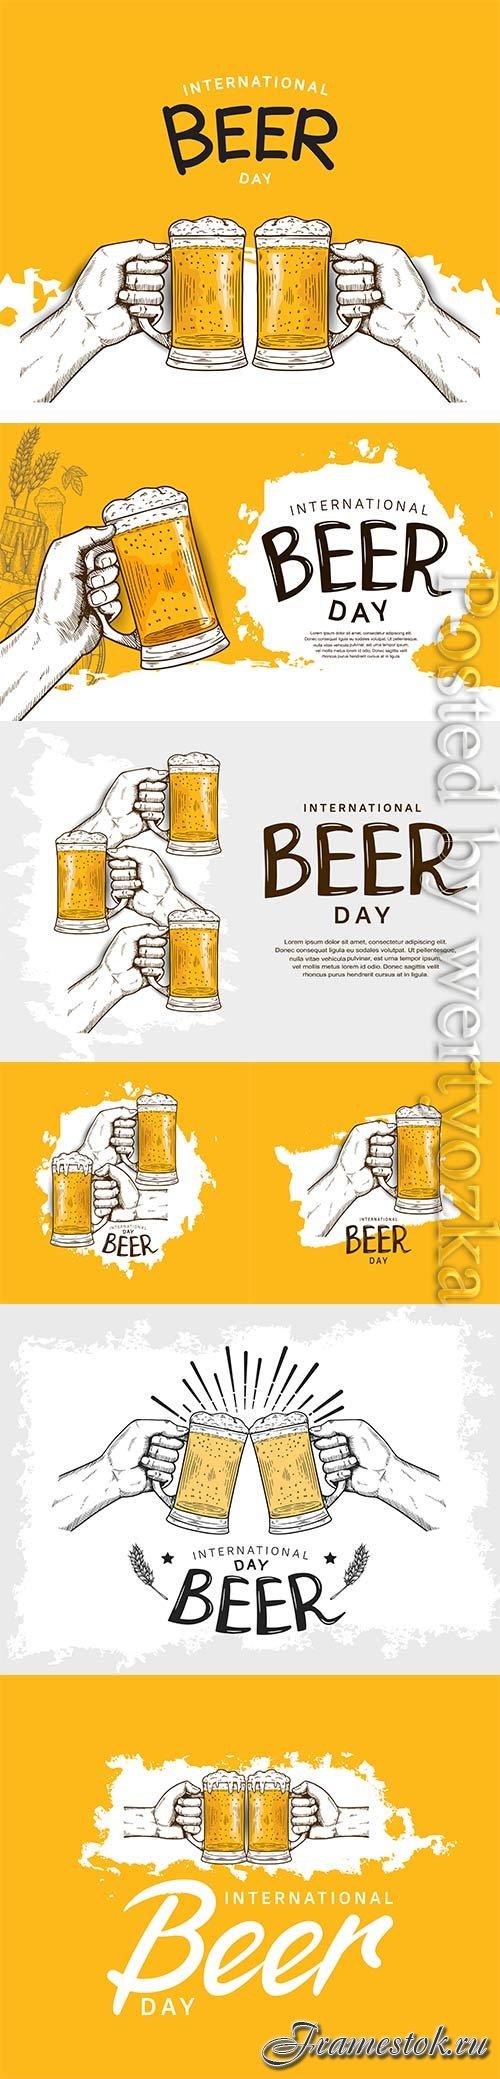 International beer day illustration vector design template